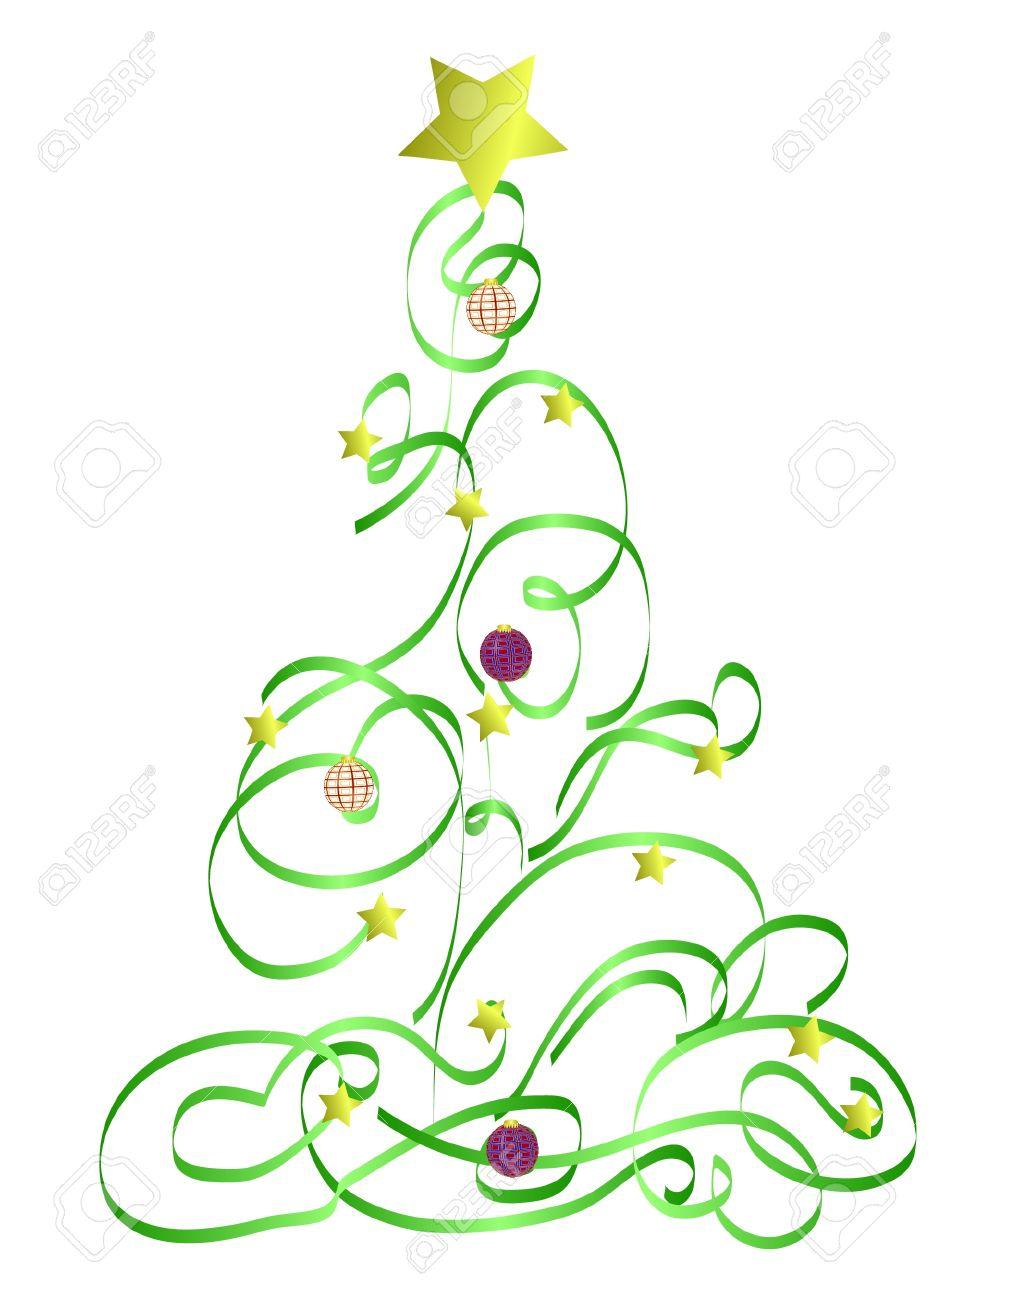 abstract christmas tree illustration royalty free cliparts vectors